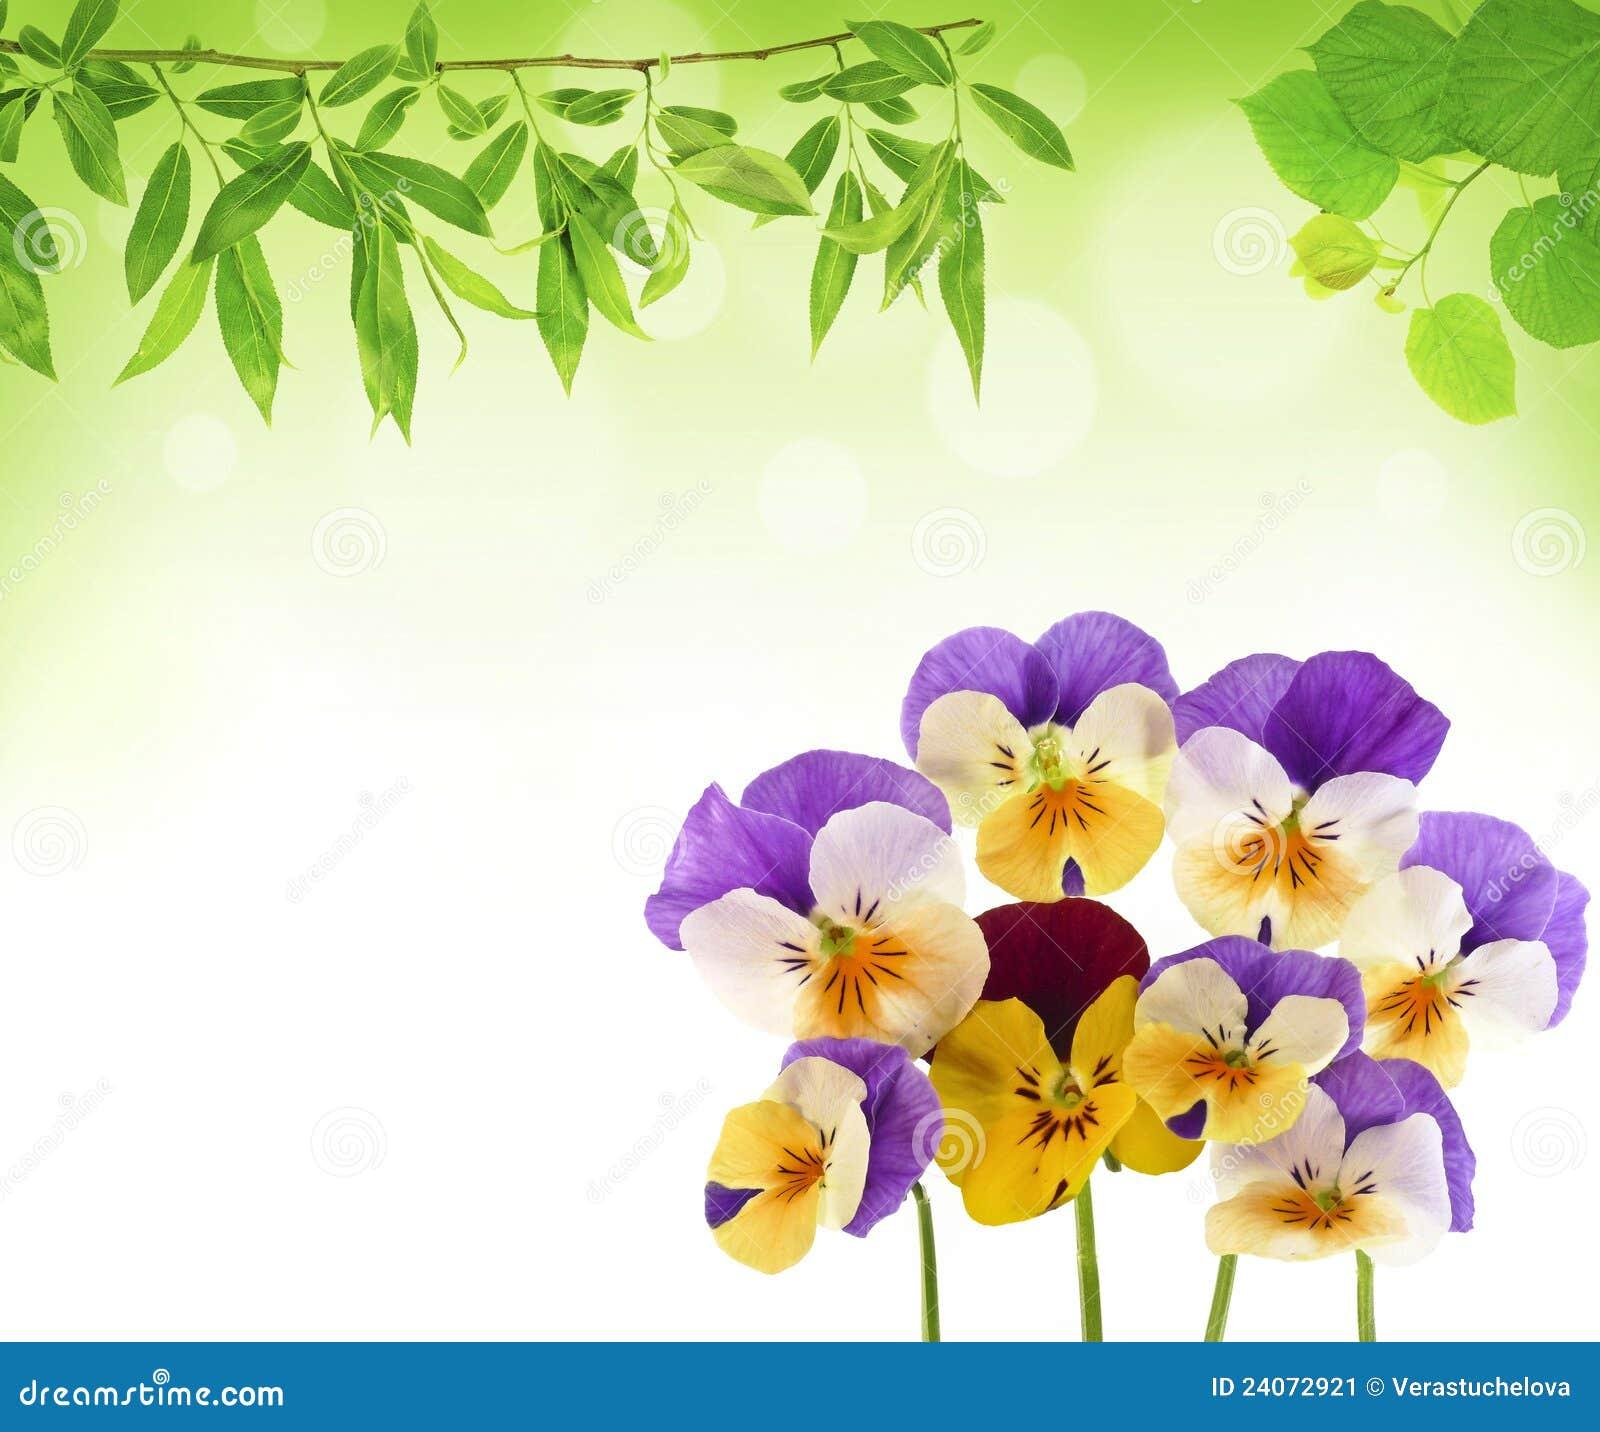 Pansyblumen